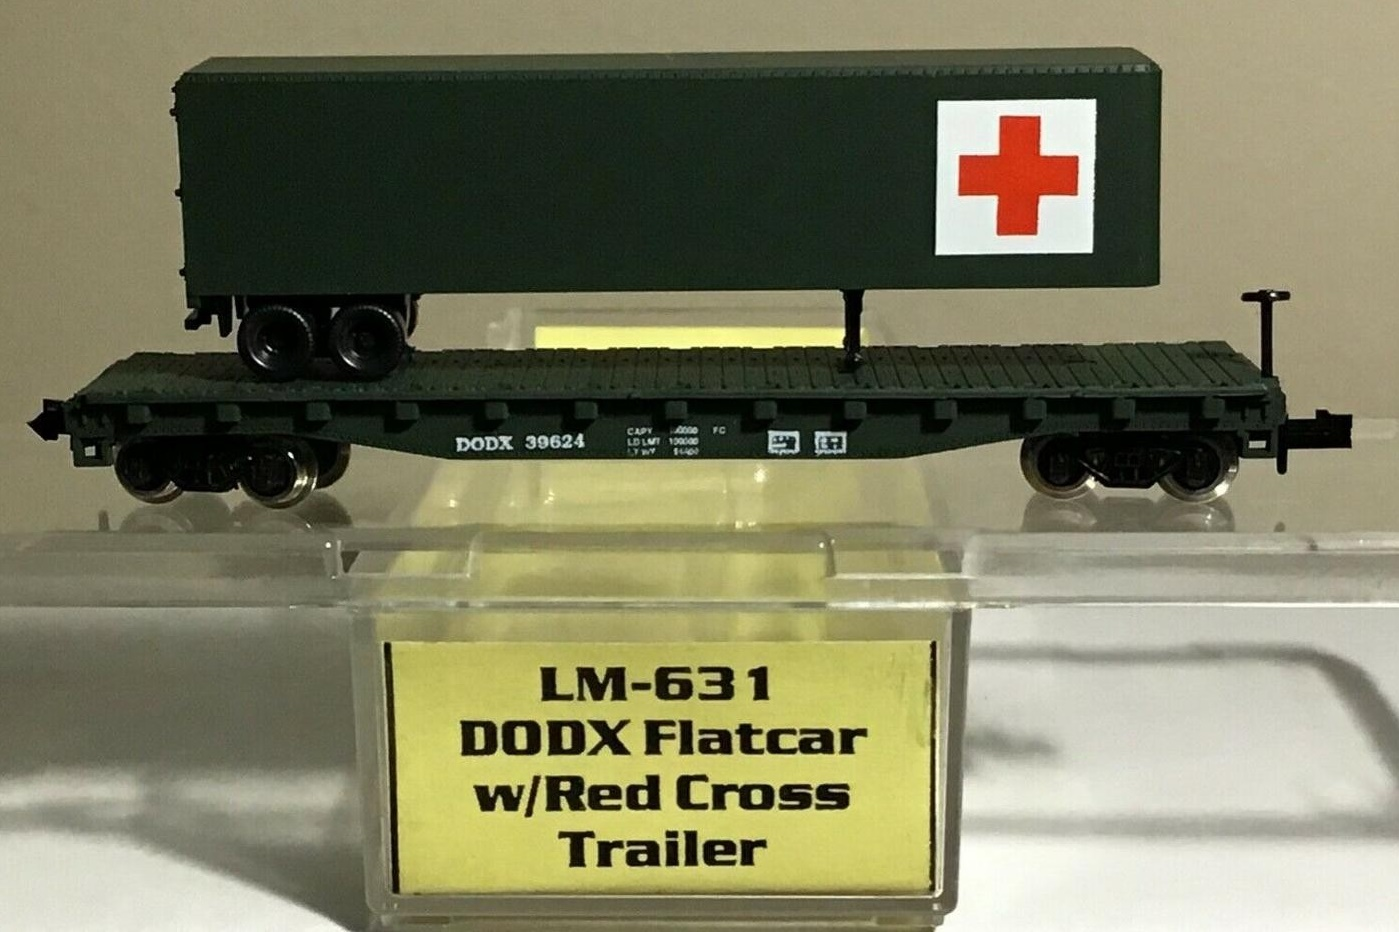 N Scale - Loco-Motives - 631 - Flatcar, 50 Foot - Department of Defense - 39624